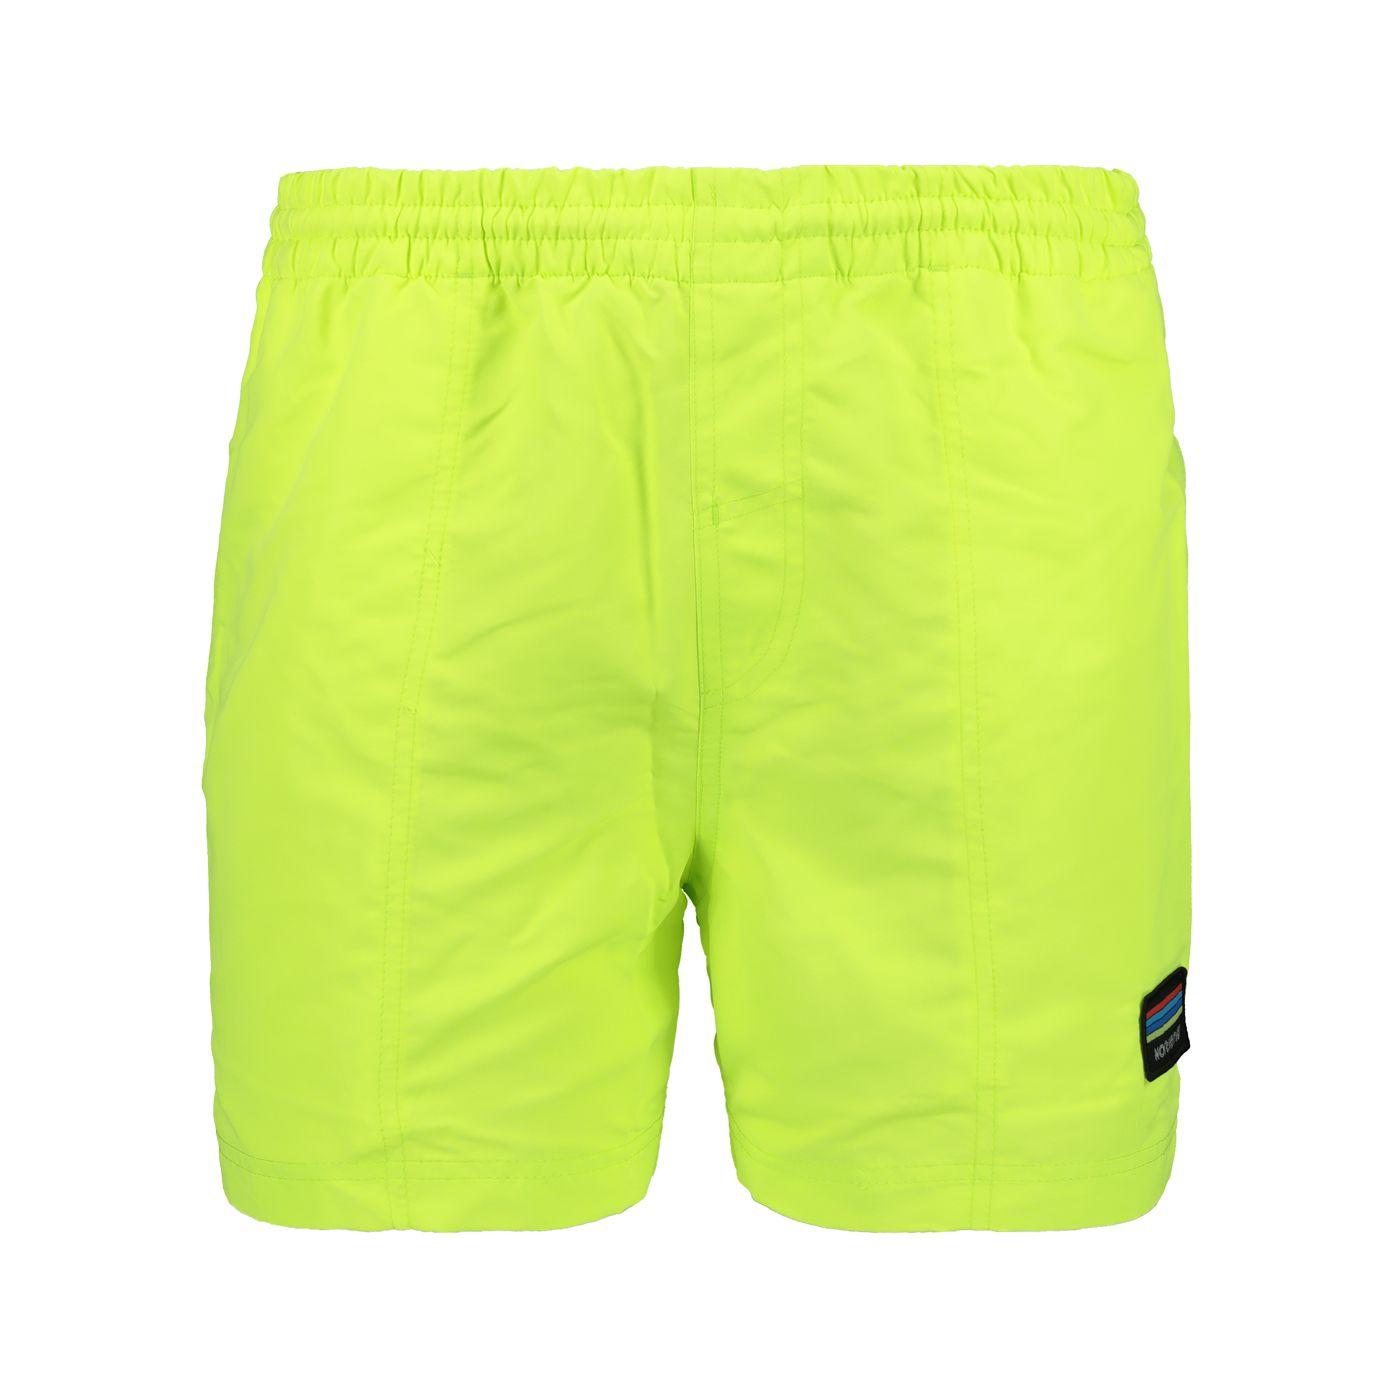 Men's shorts NORTHFINDER BERTION